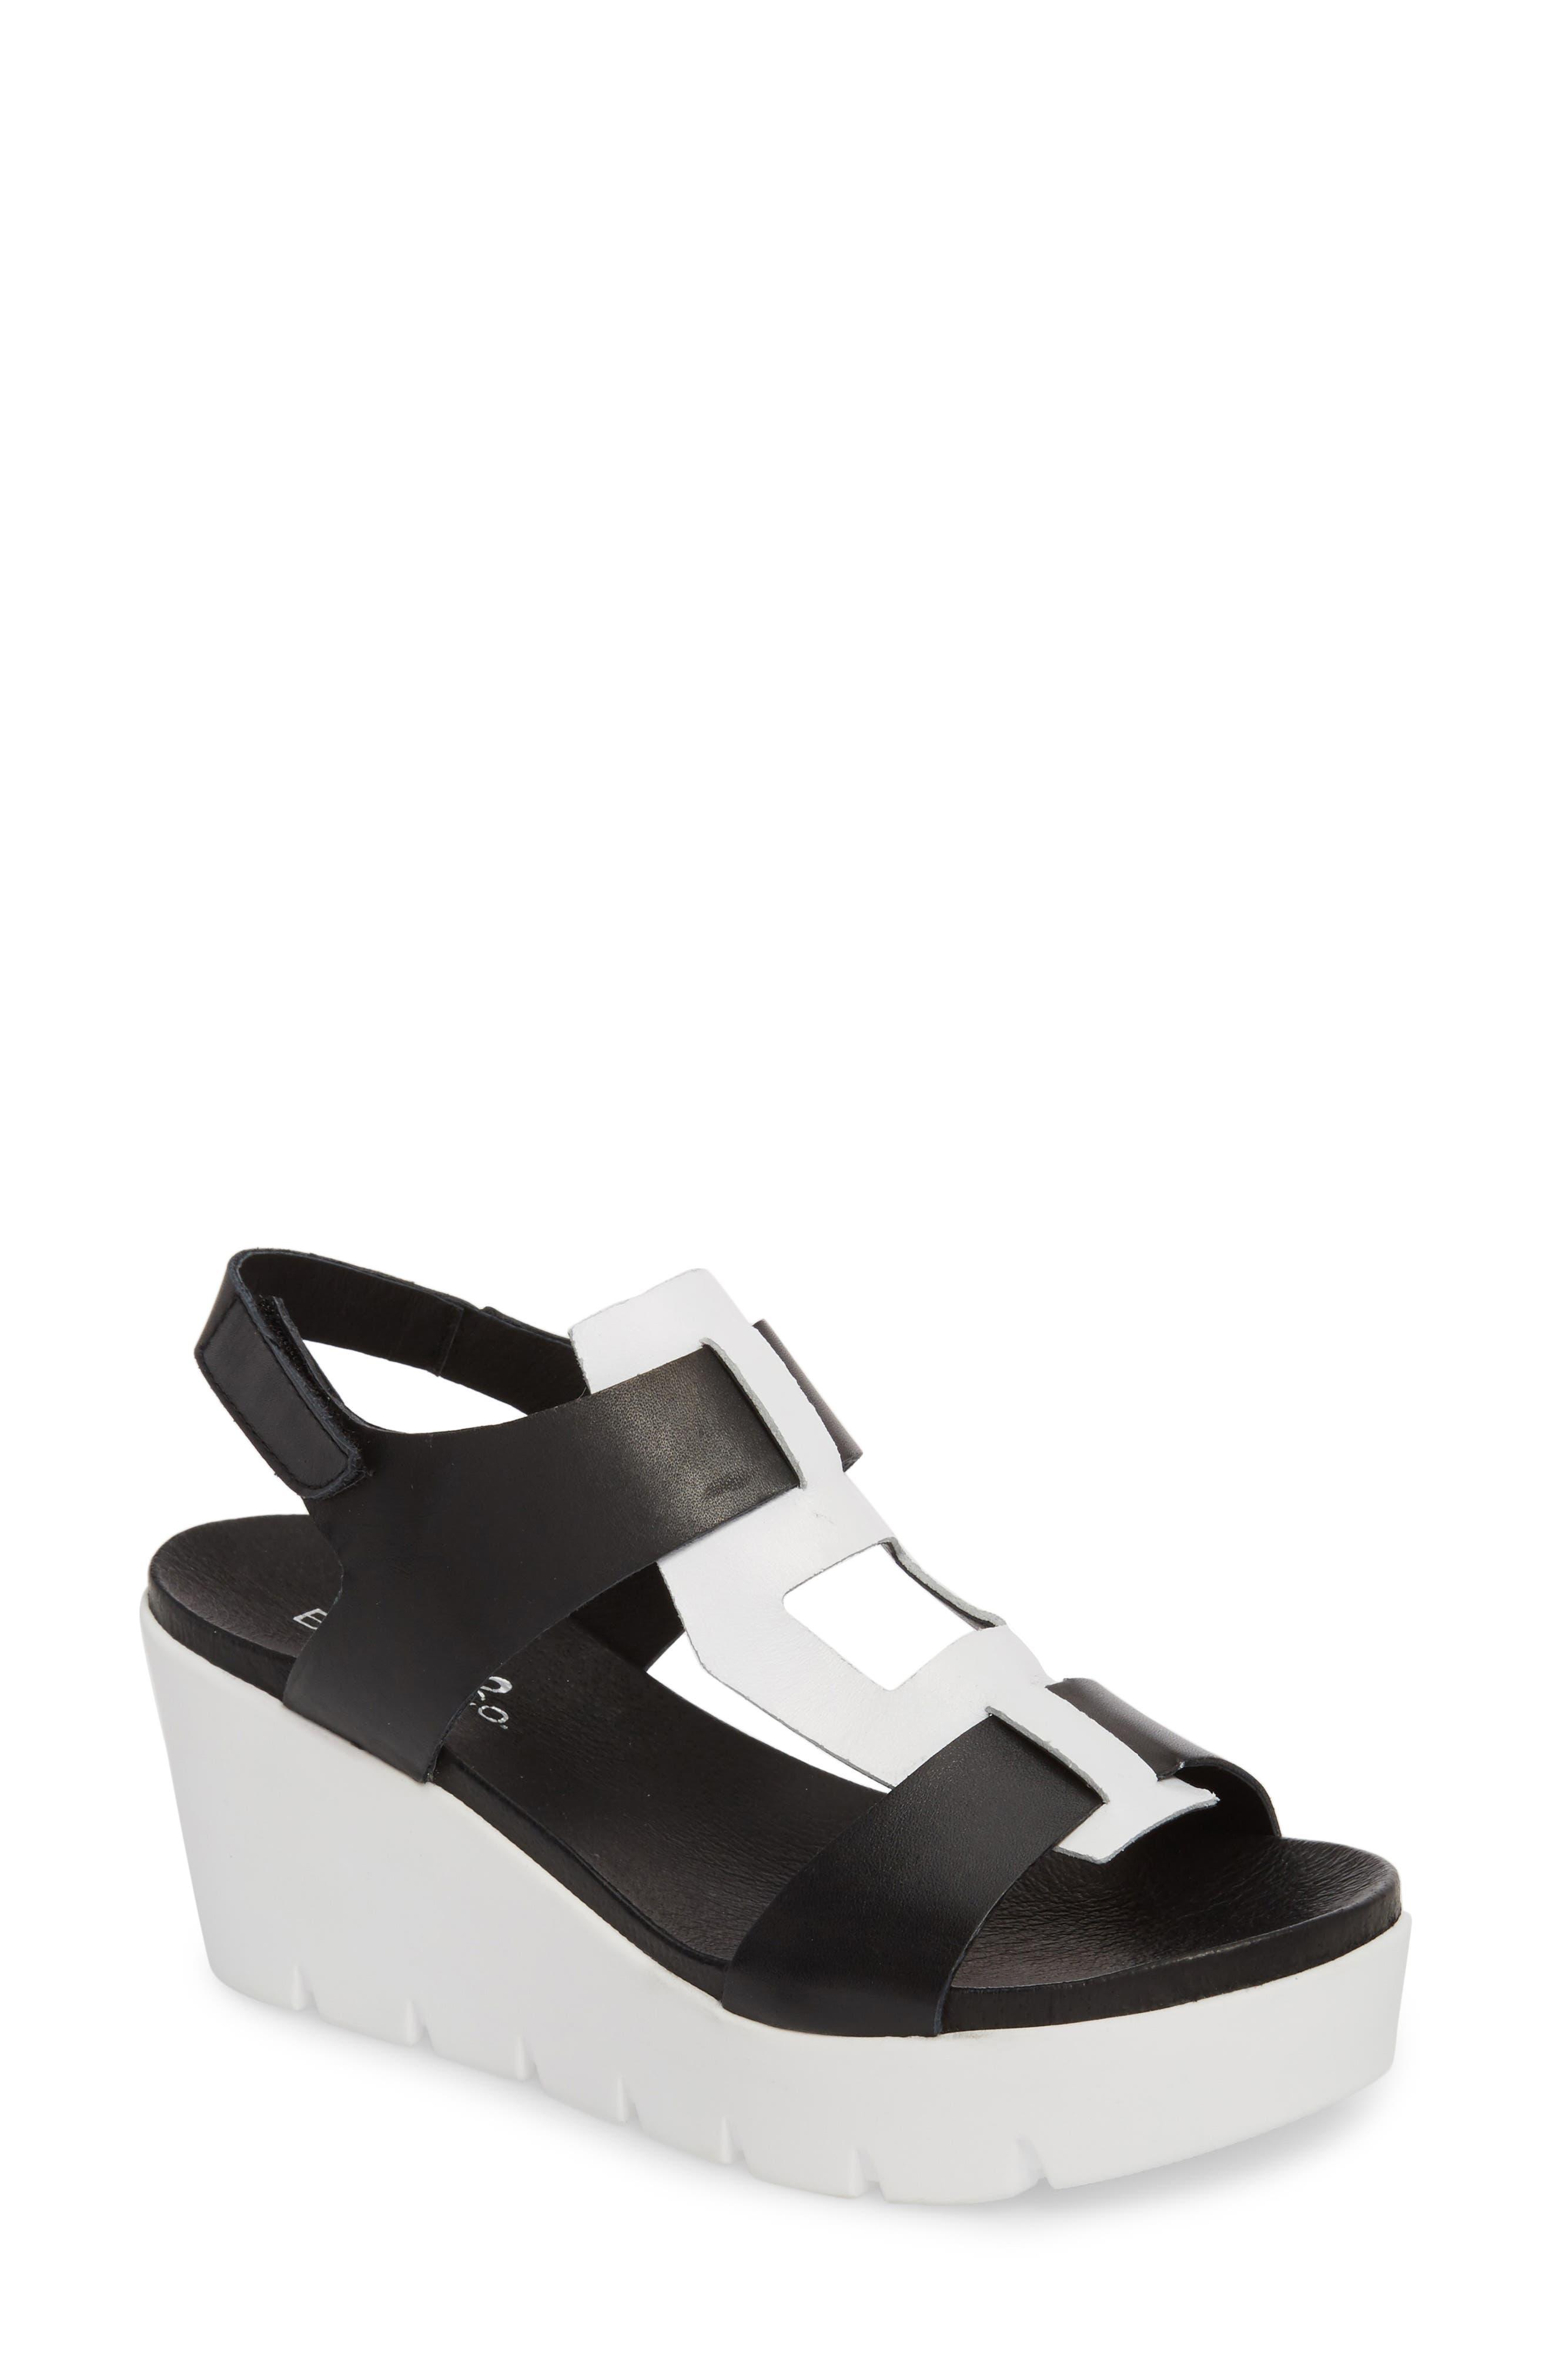 Bos. & Co. Somo Platform Wedge Sandal - Black